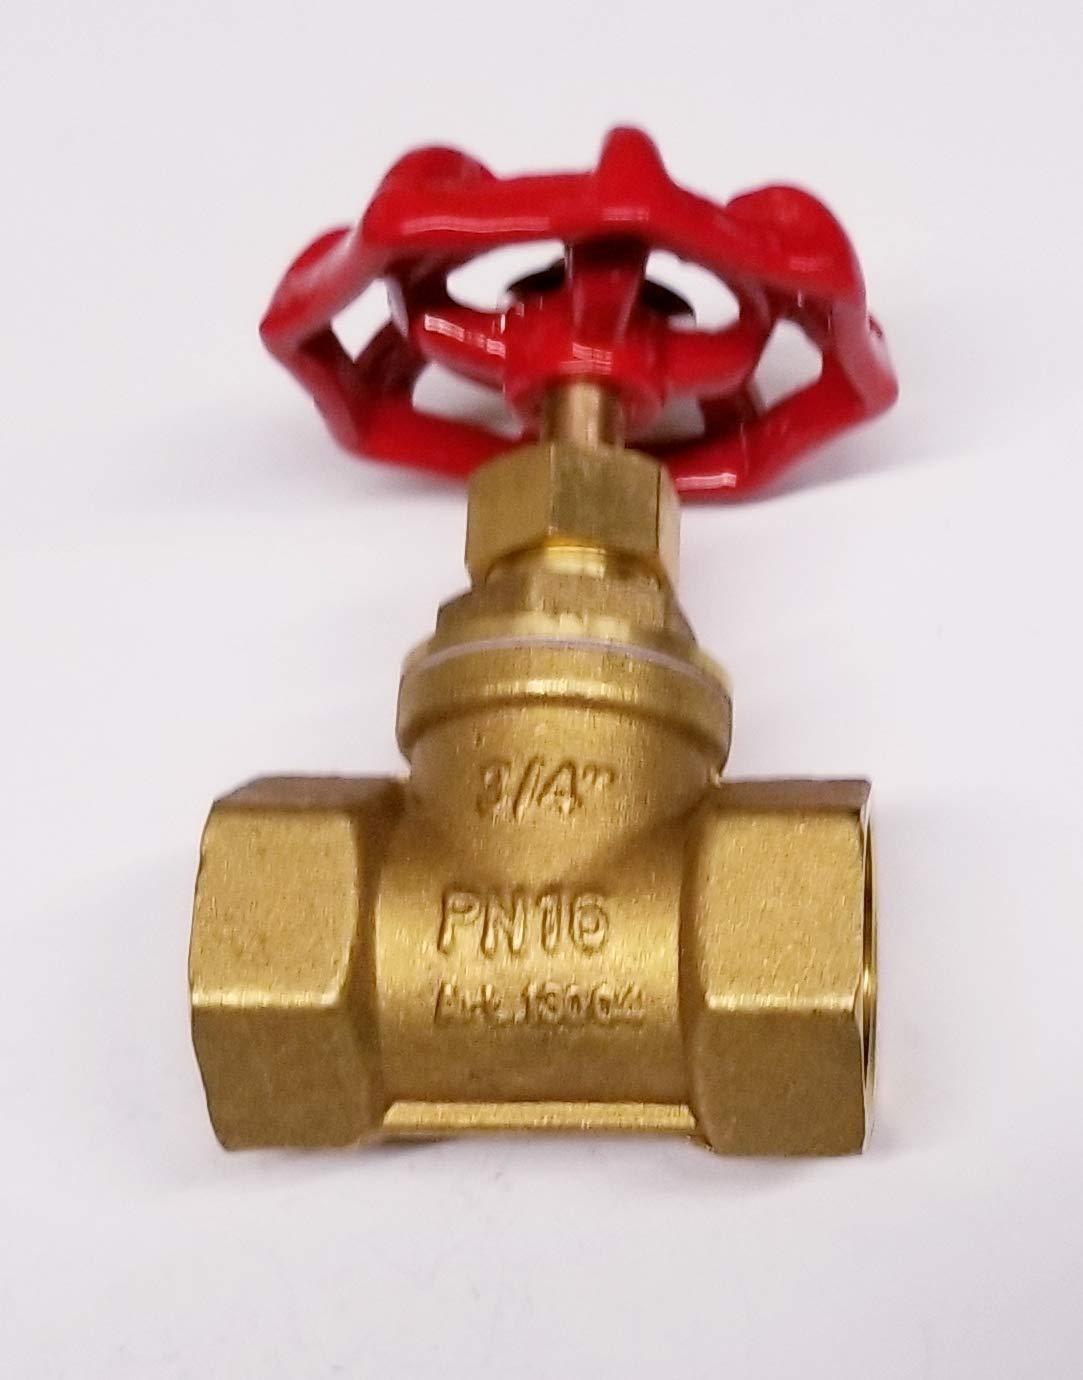 TIB Brass Globe Valve 3/4''npt Female Fnpt Class 150 by TIB (Image #2)